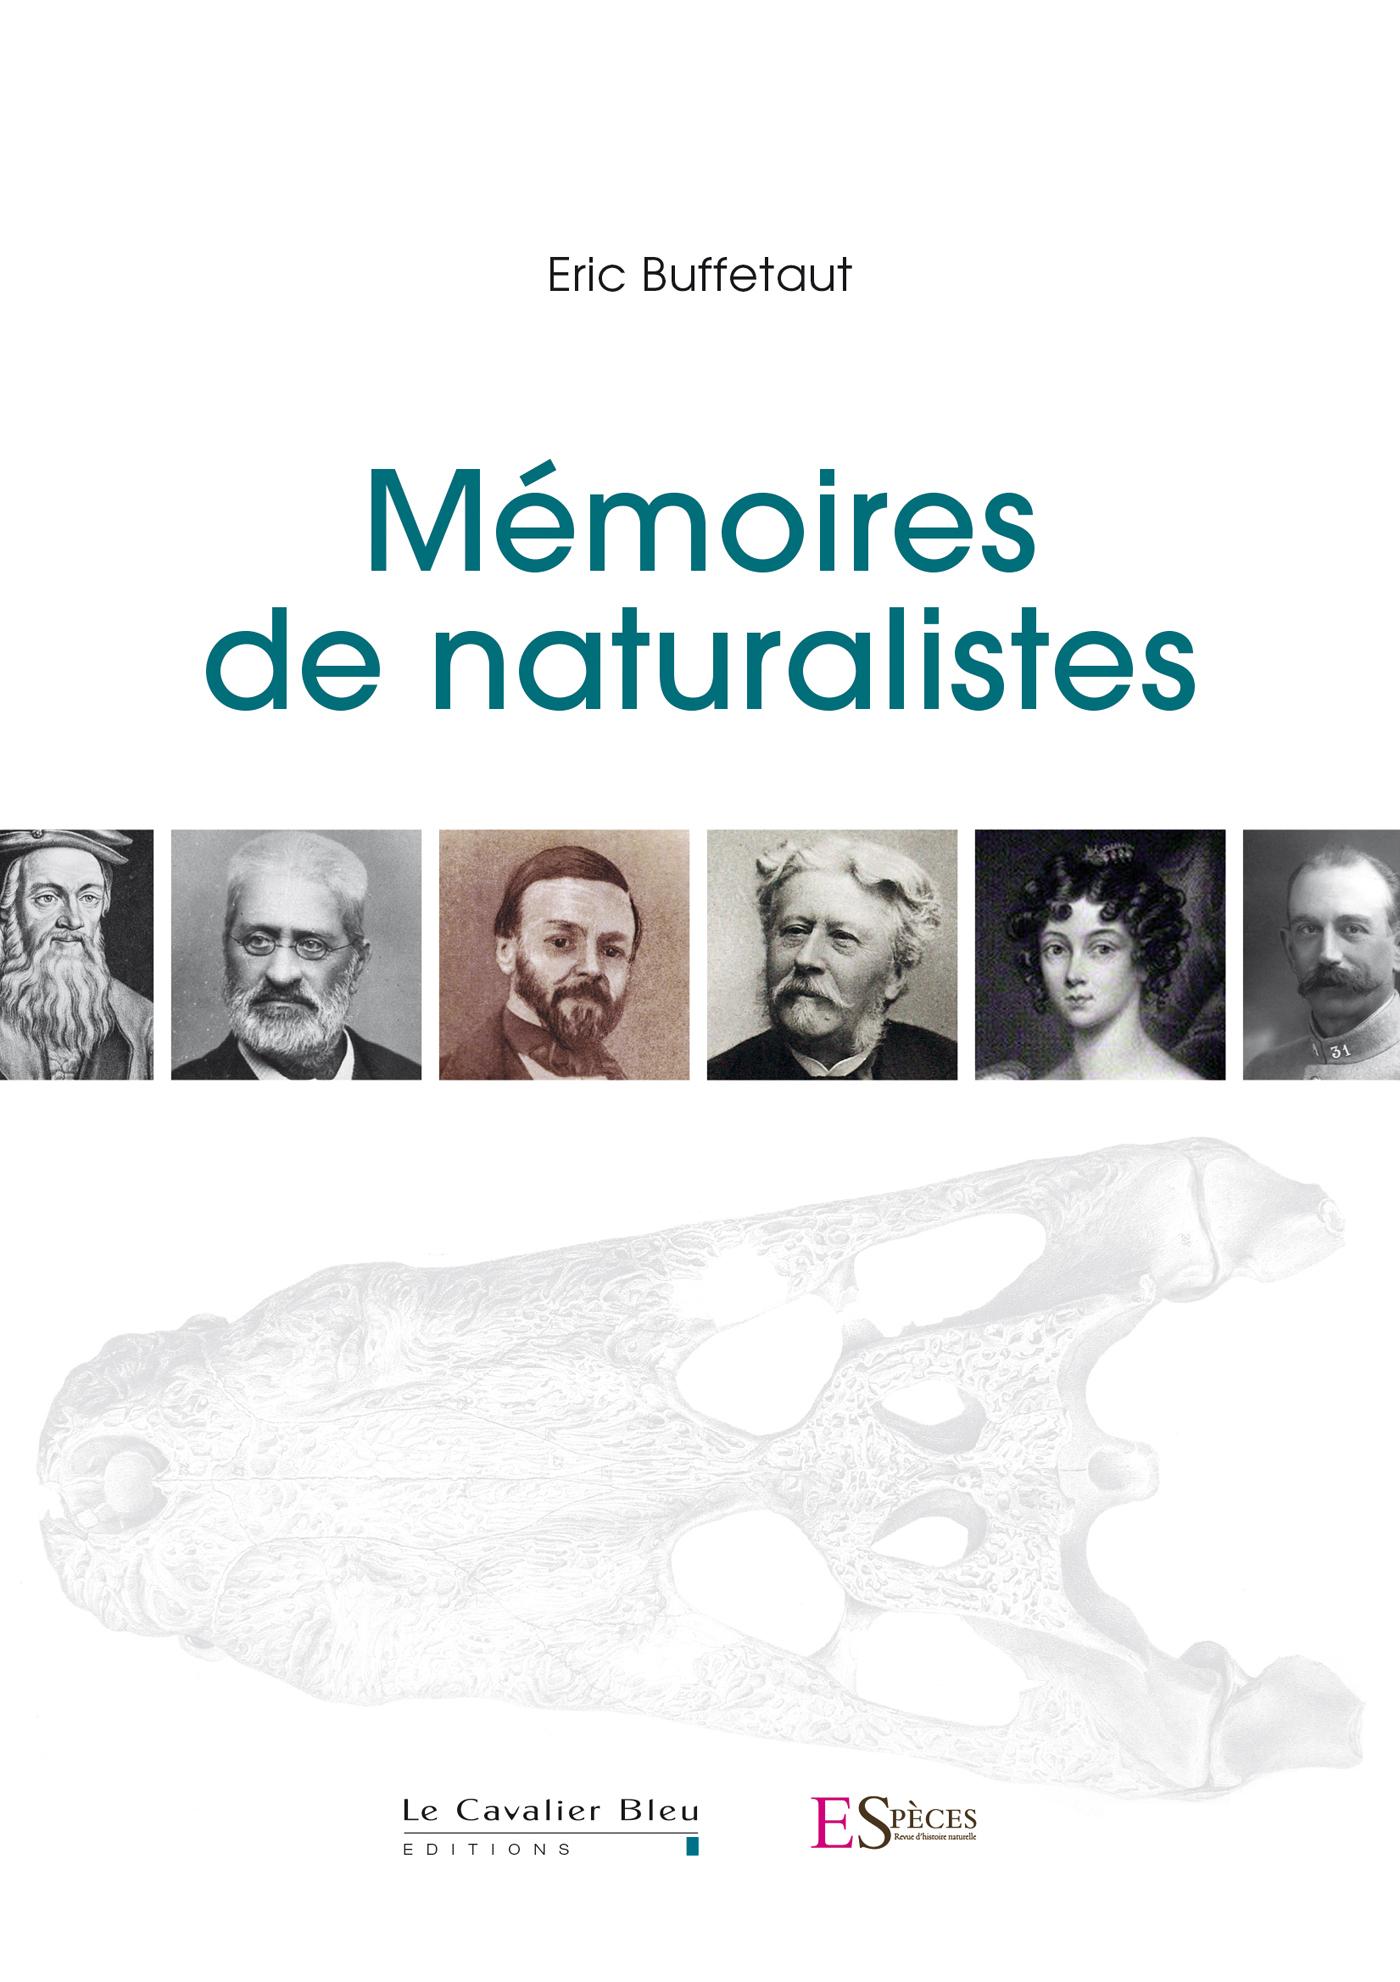 MEMOIRES DE NATURALISTES